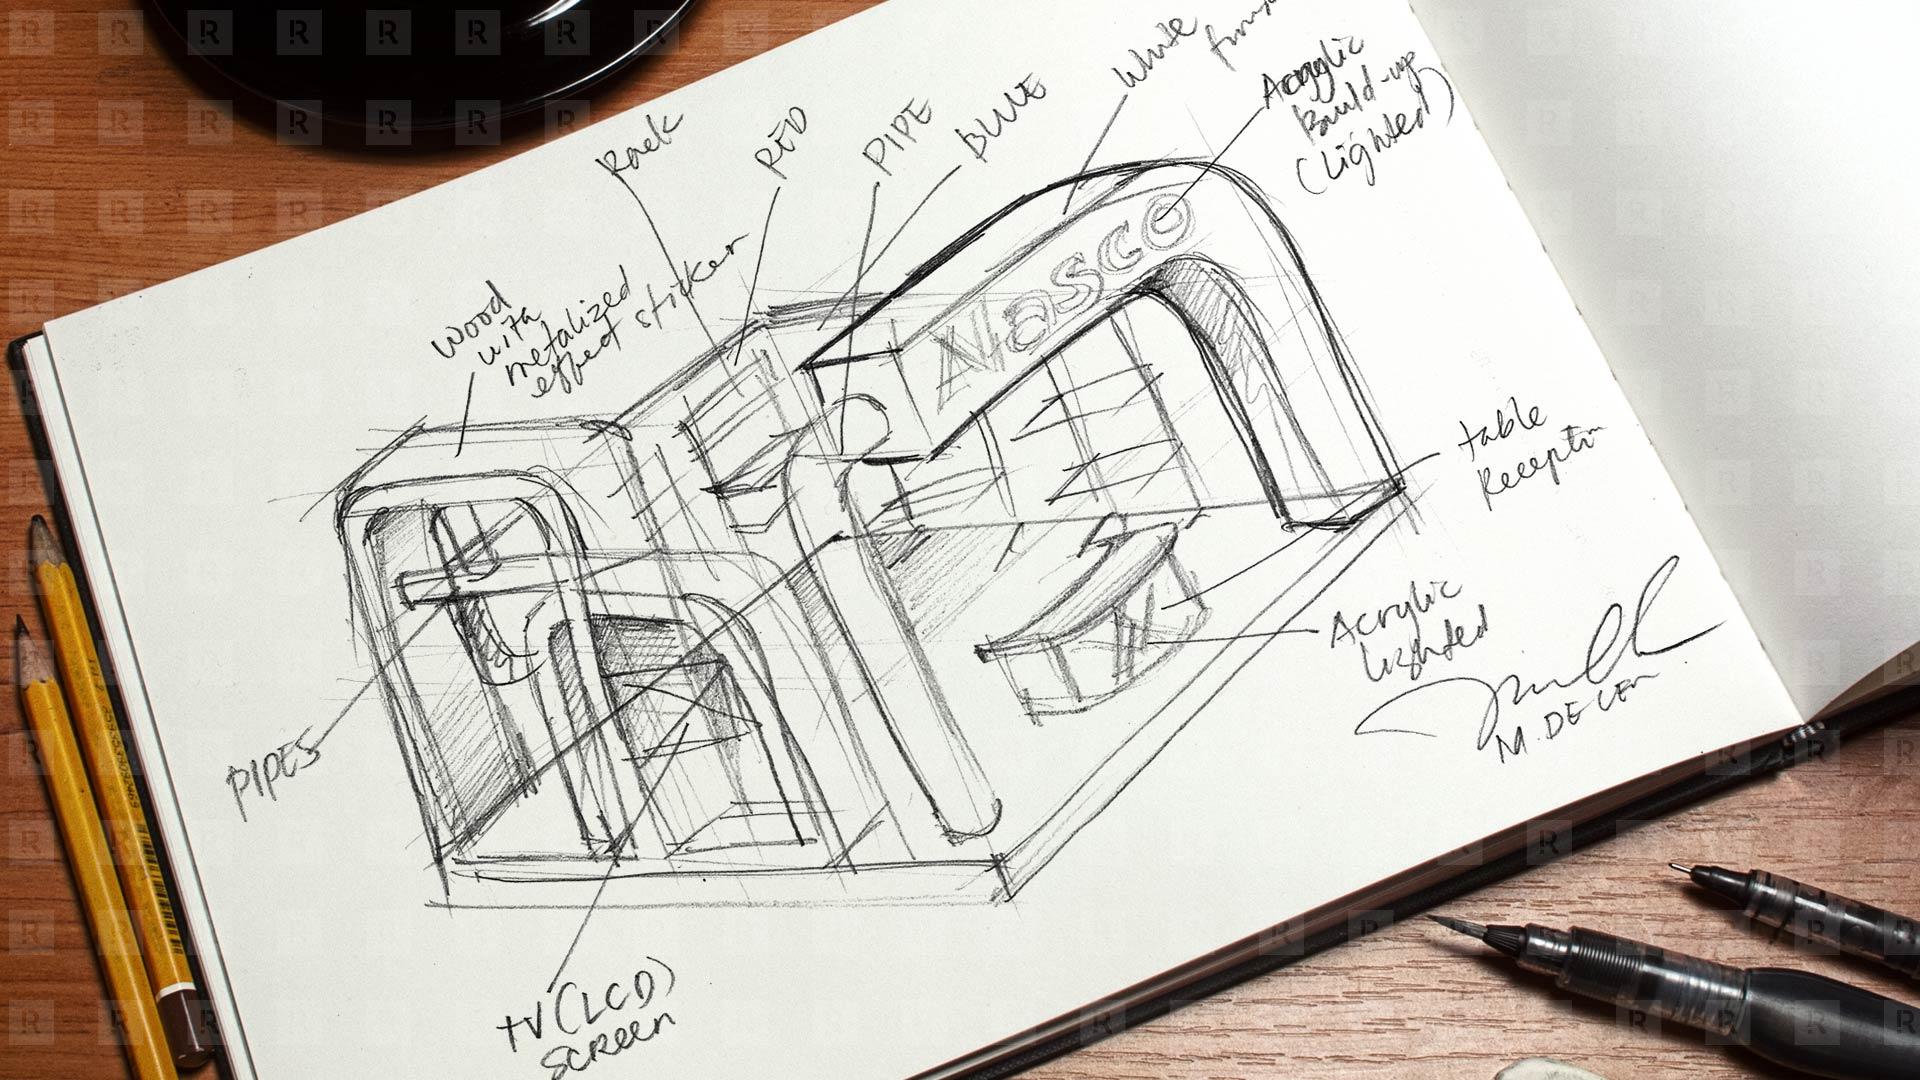 Alasco Booth Design Sketch